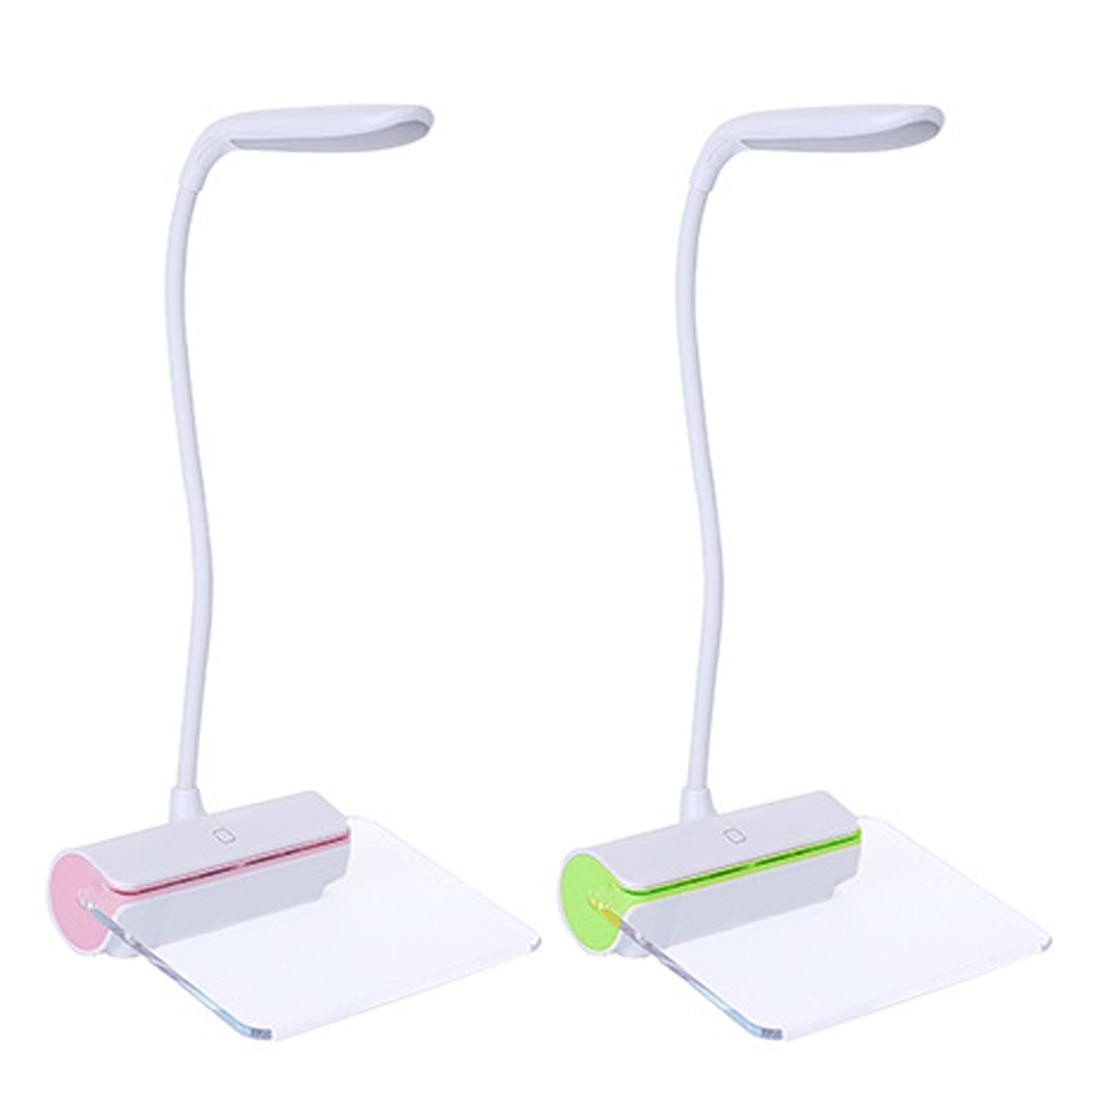 1.5 W Usb Opladen Tl Message Board Touch Nachtlampje 3 Niveau Licht Verstelbare Oplaadbare Tafellamp Led Light Switch